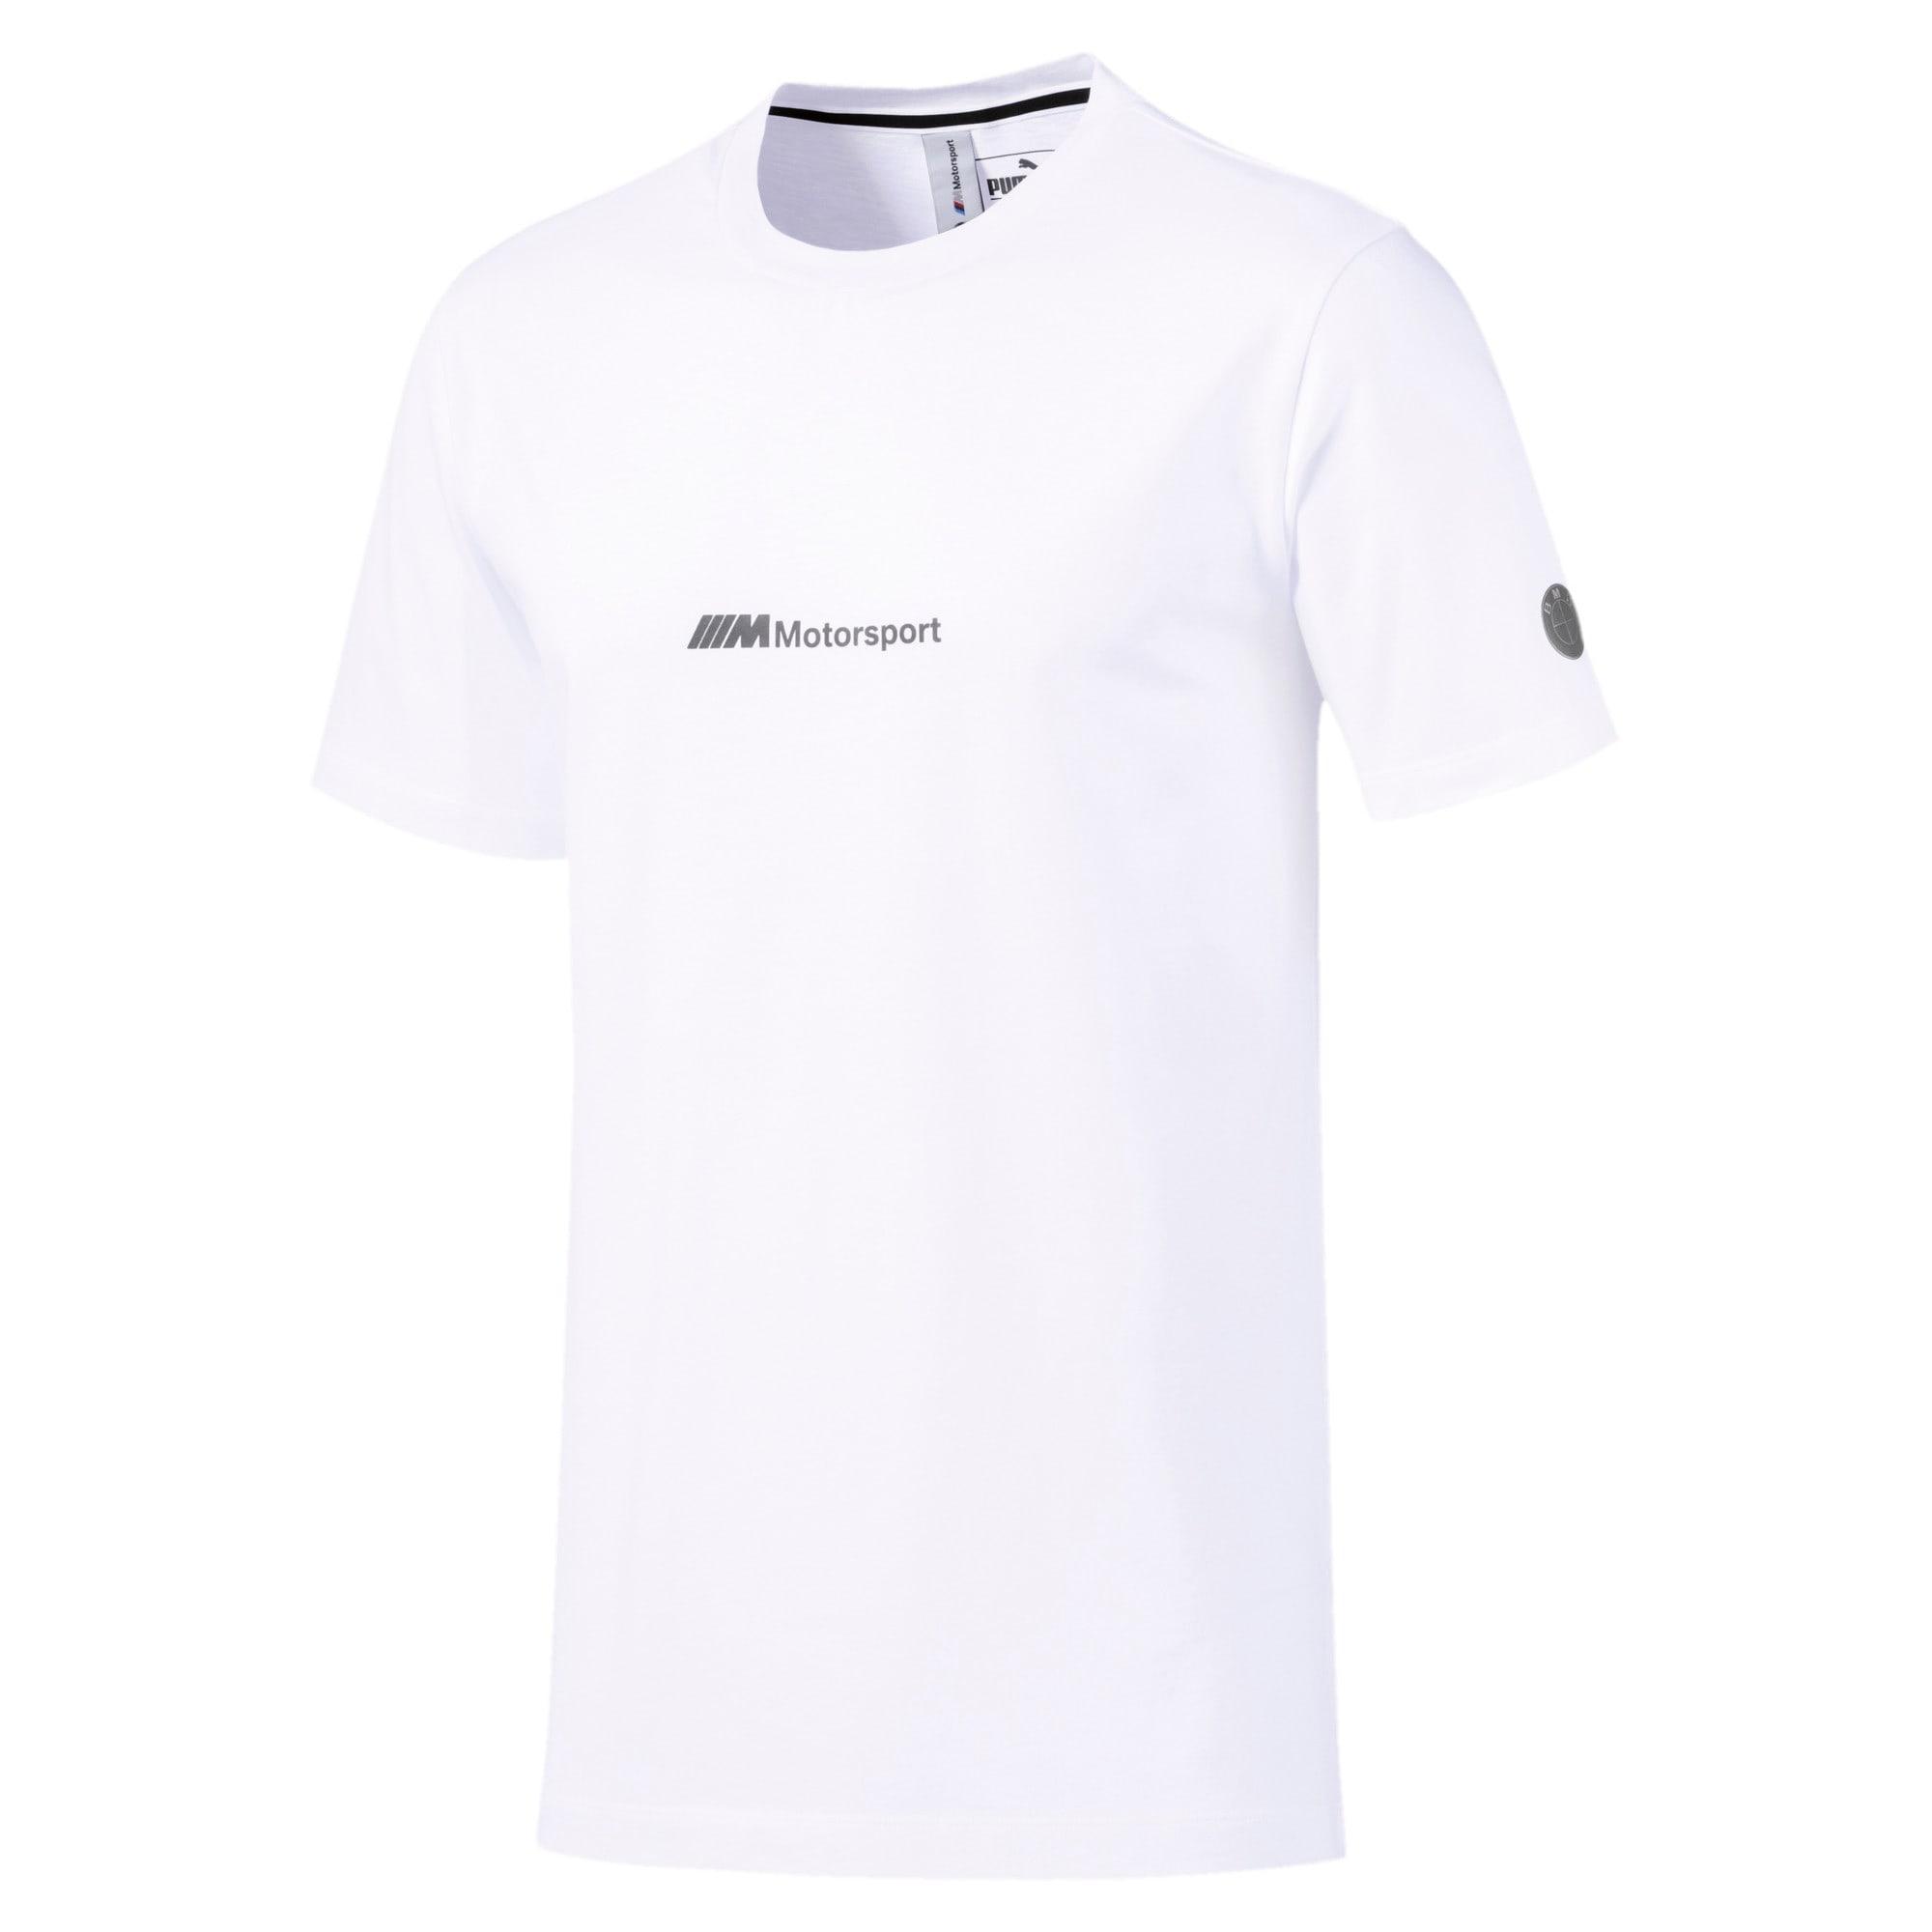 Thumbnail 3 of BMW Motorsport Life T-shirt voor heren, Puma White, medium